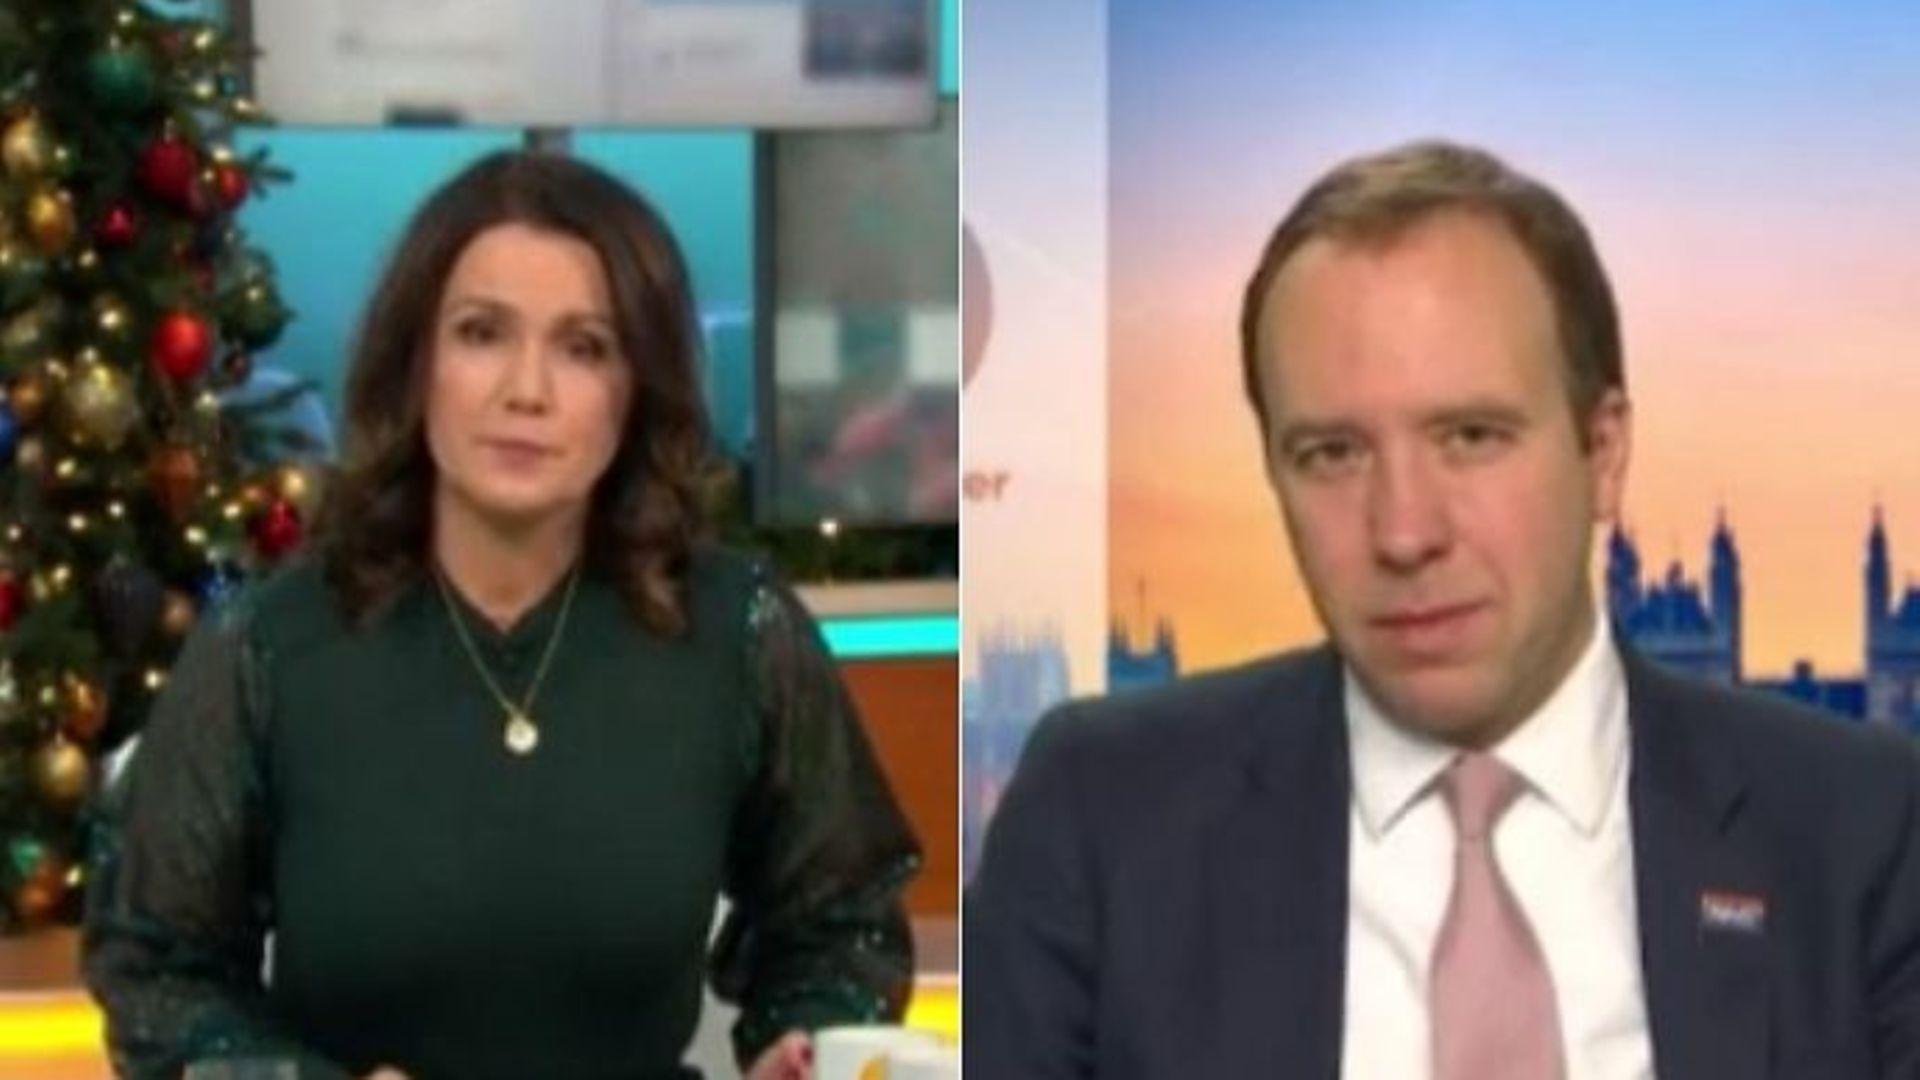 Susanna Reid interviews Matt Hancock about the Covid-19 vaccine on Good Morning Britain - Credit: ITV